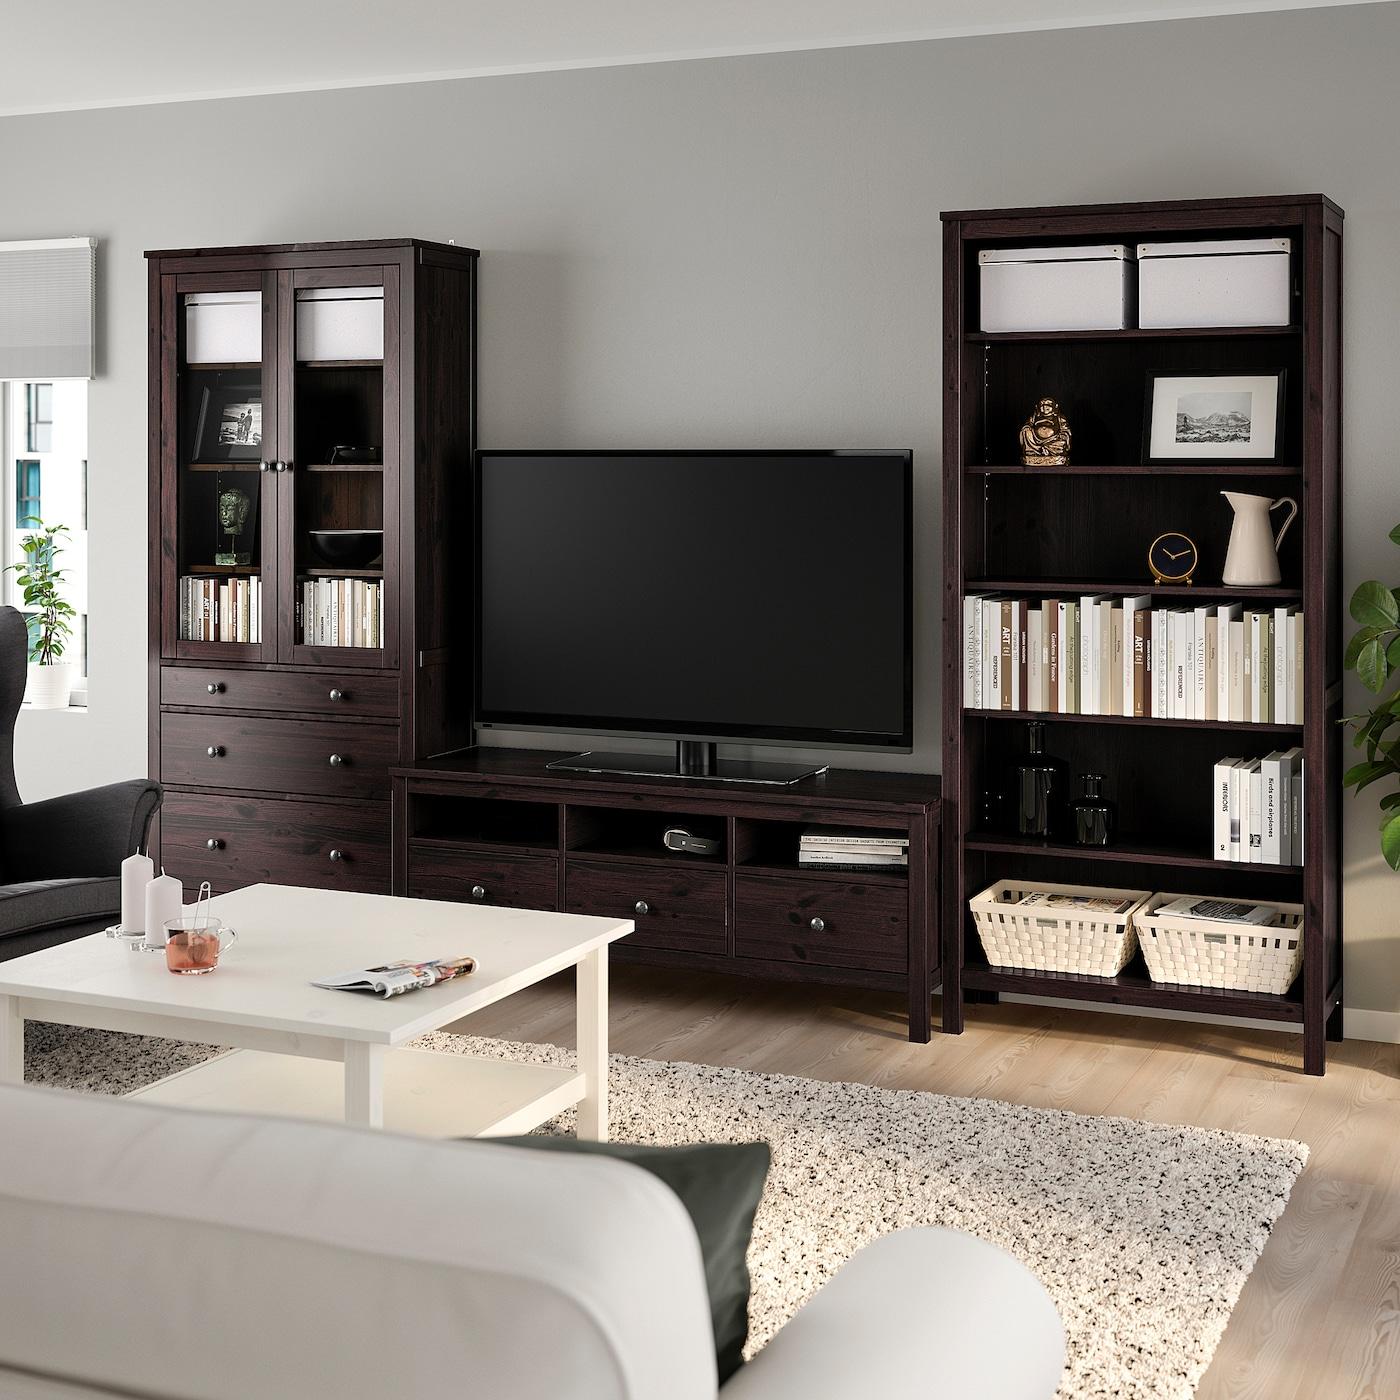 HEMNES TV storage combination - black-brown/clear glass 9x9 cm